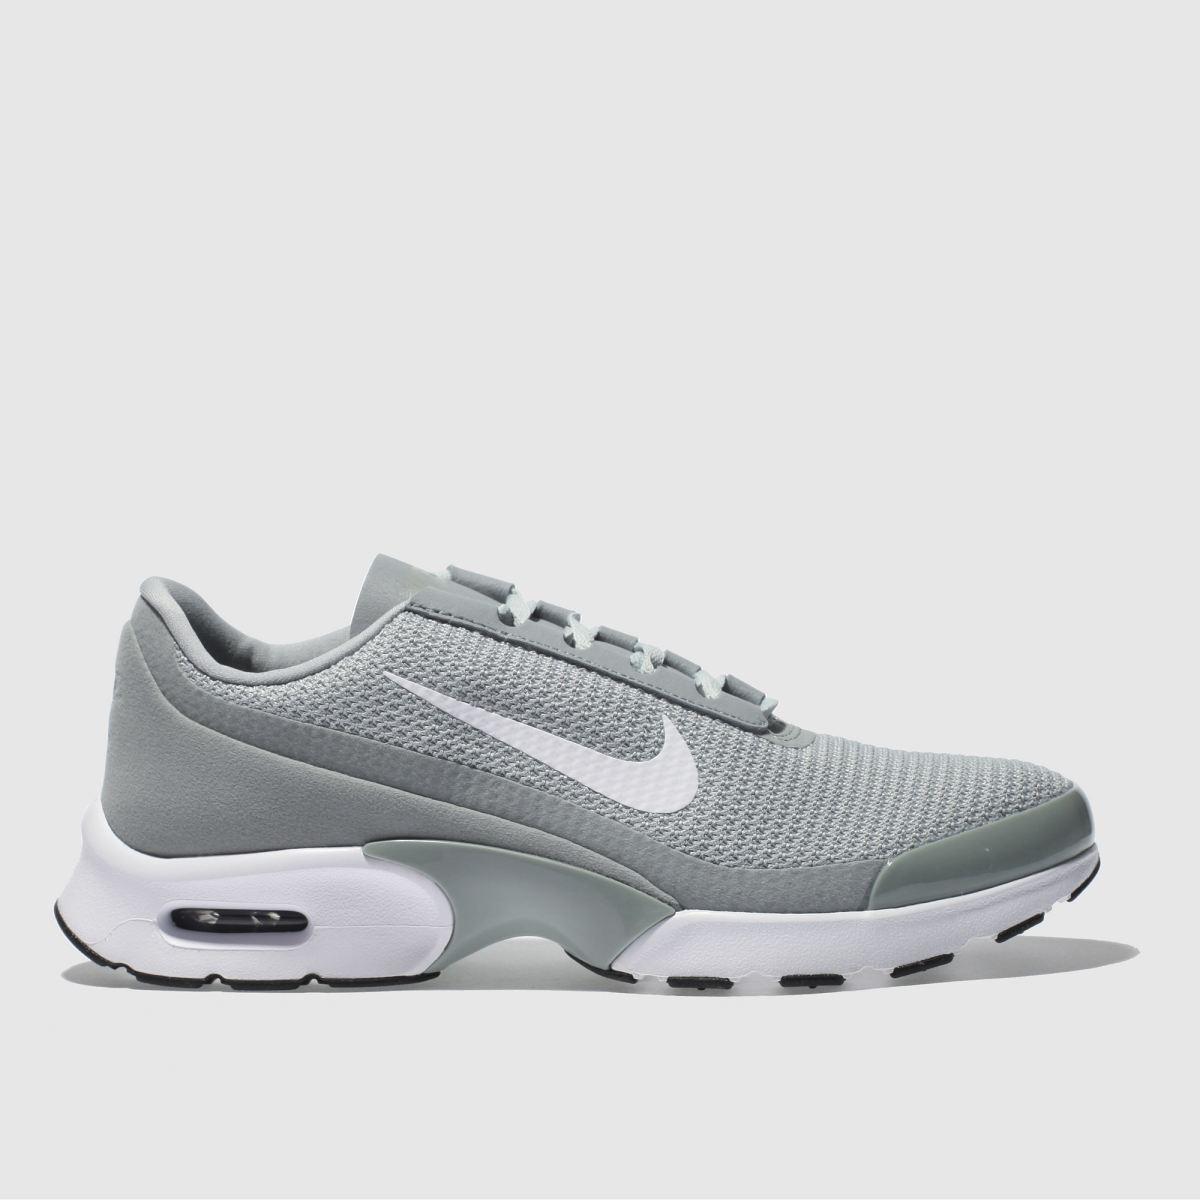 Nike Light Grey Air Max Jewel Trainers